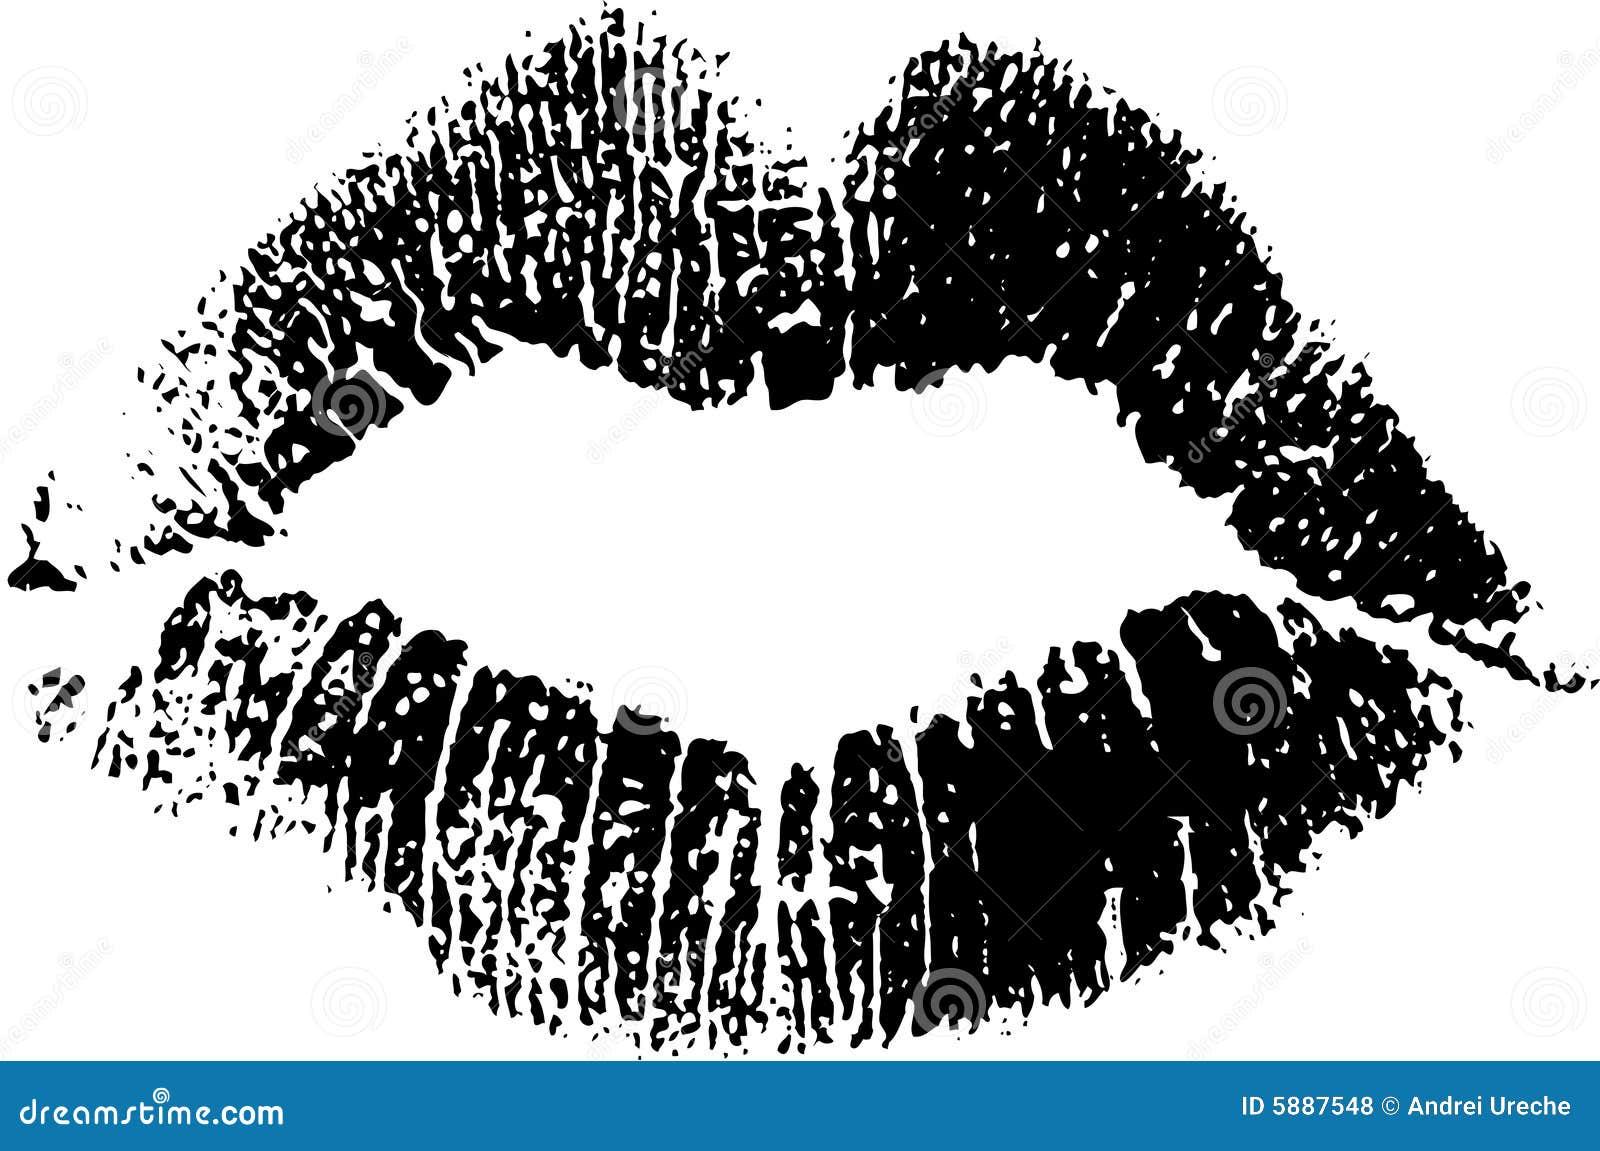 black lipstick kiss stock illustrations 1 282 black lipstick kiss